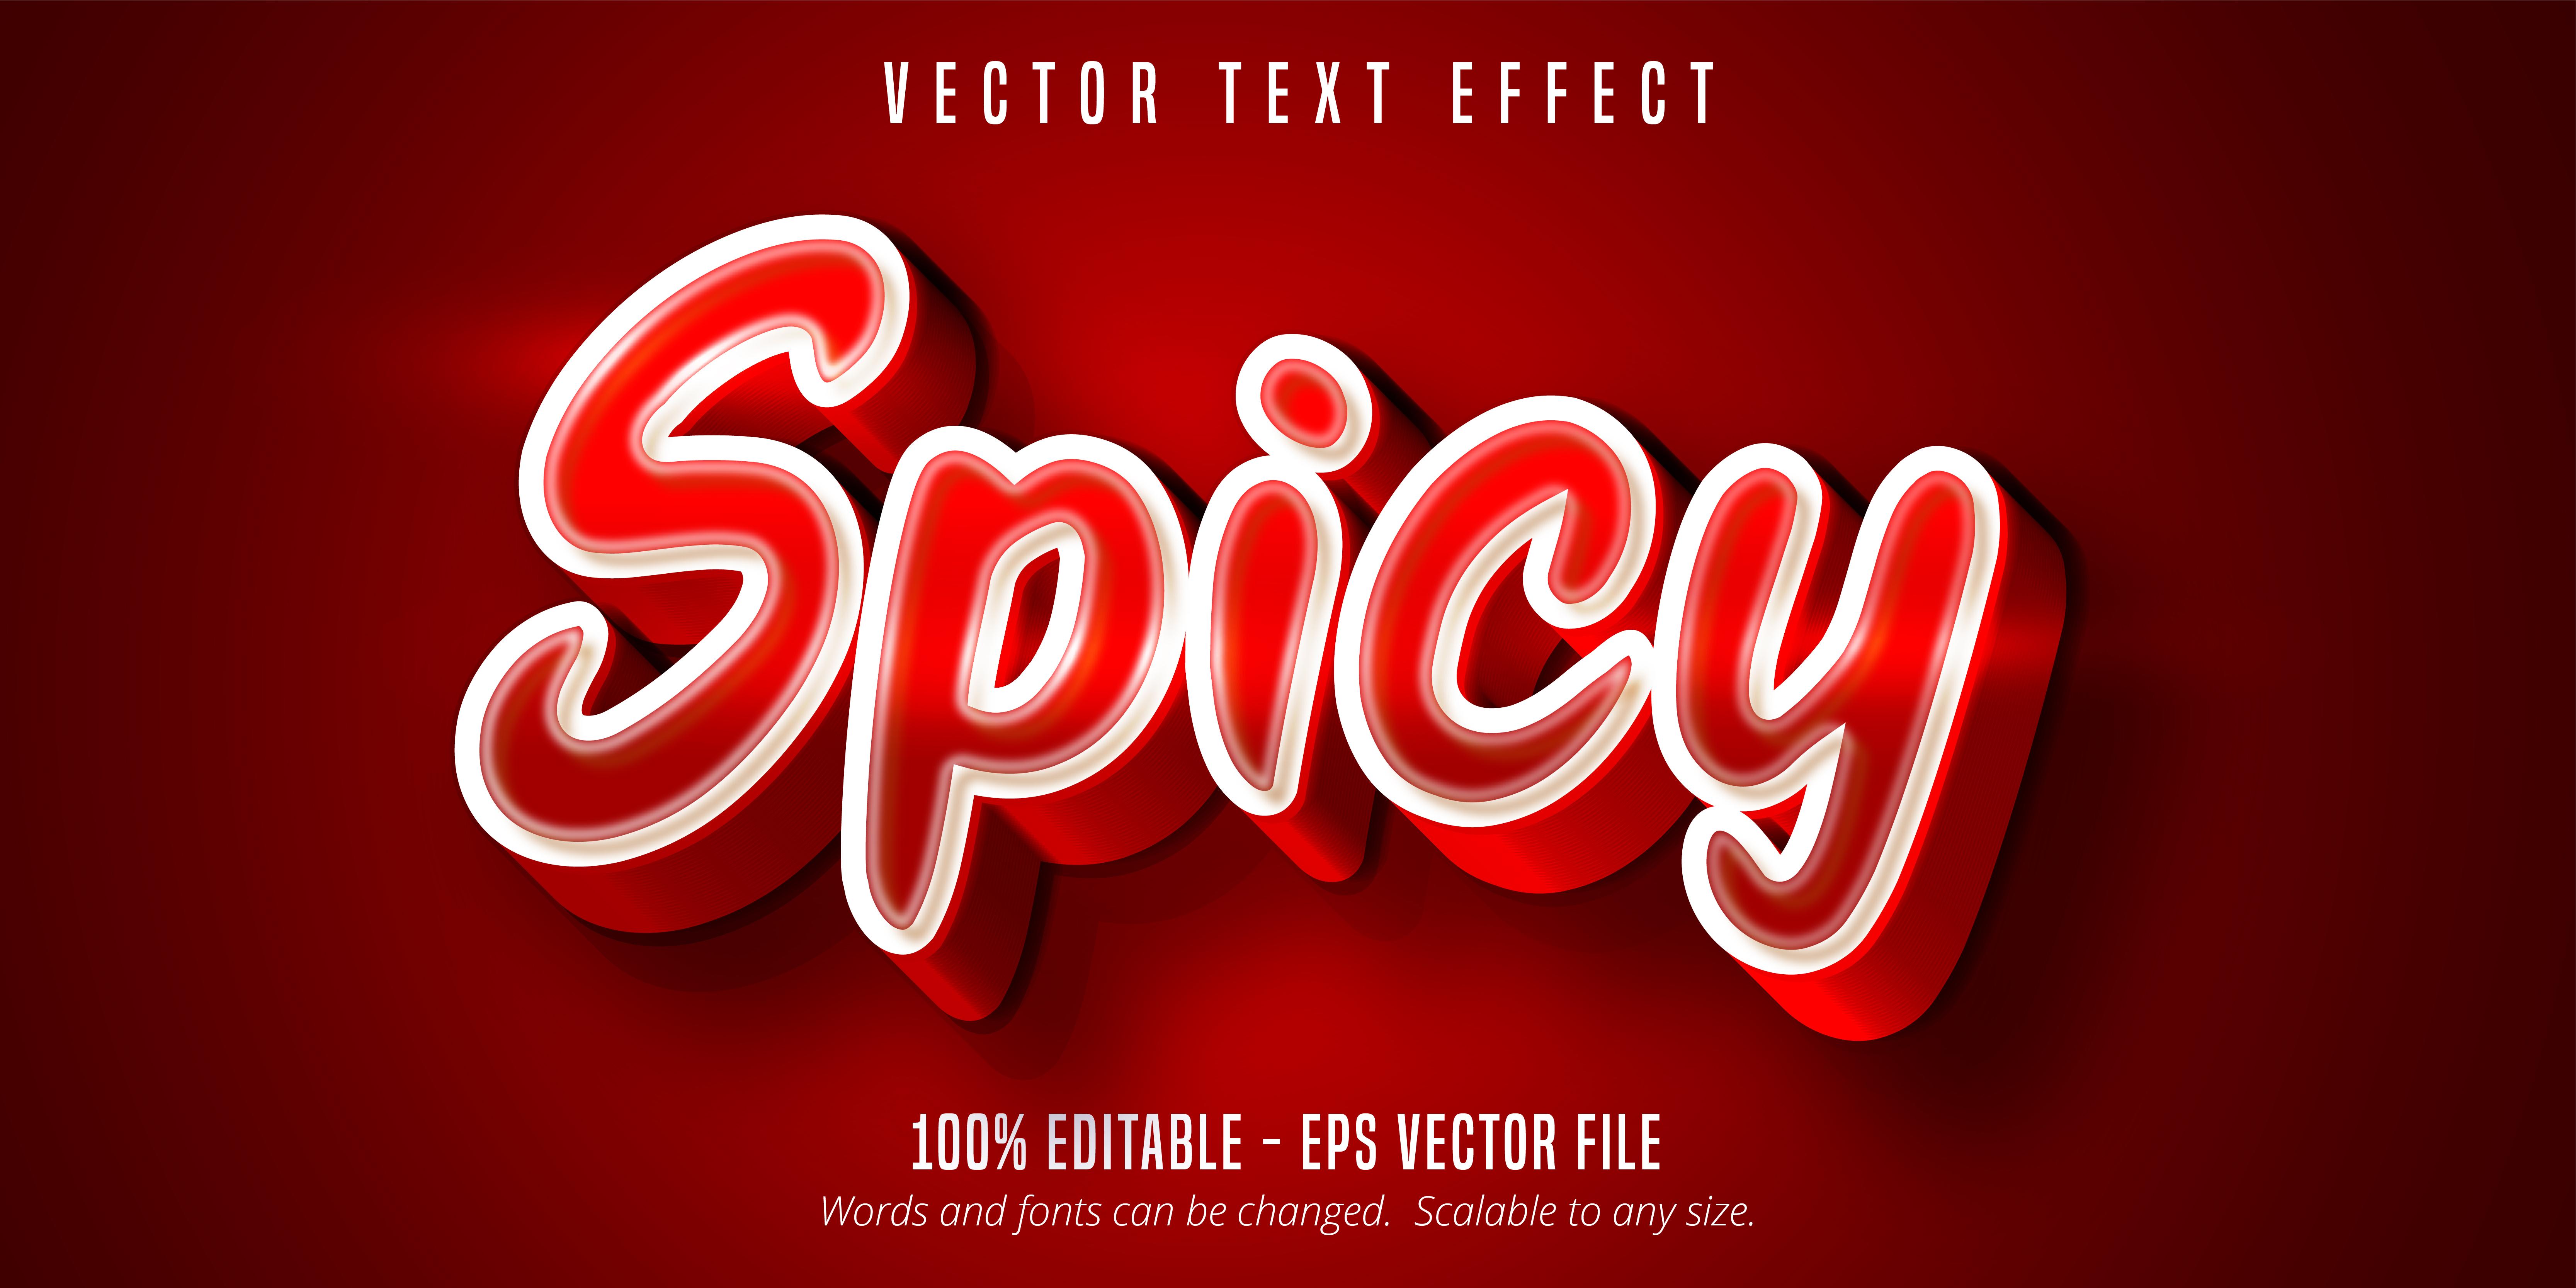 texto picante, efecto de texto de color rojo